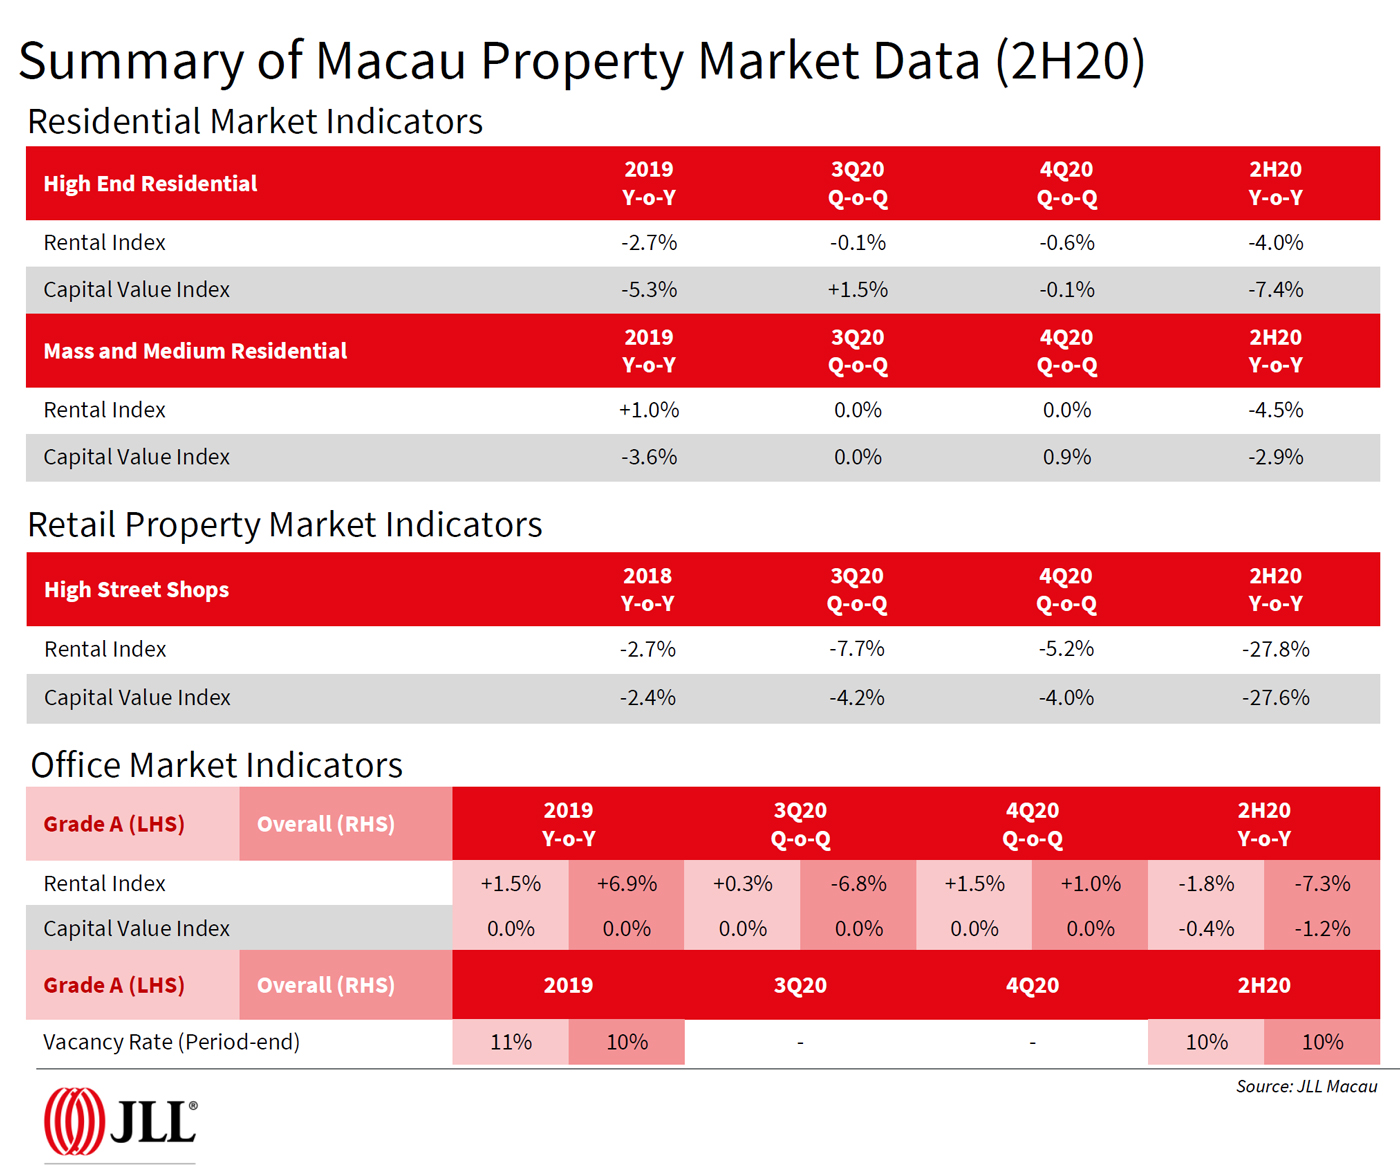 Summary-of-Macau-Property-Market-Data-2H20---JLL.jpg